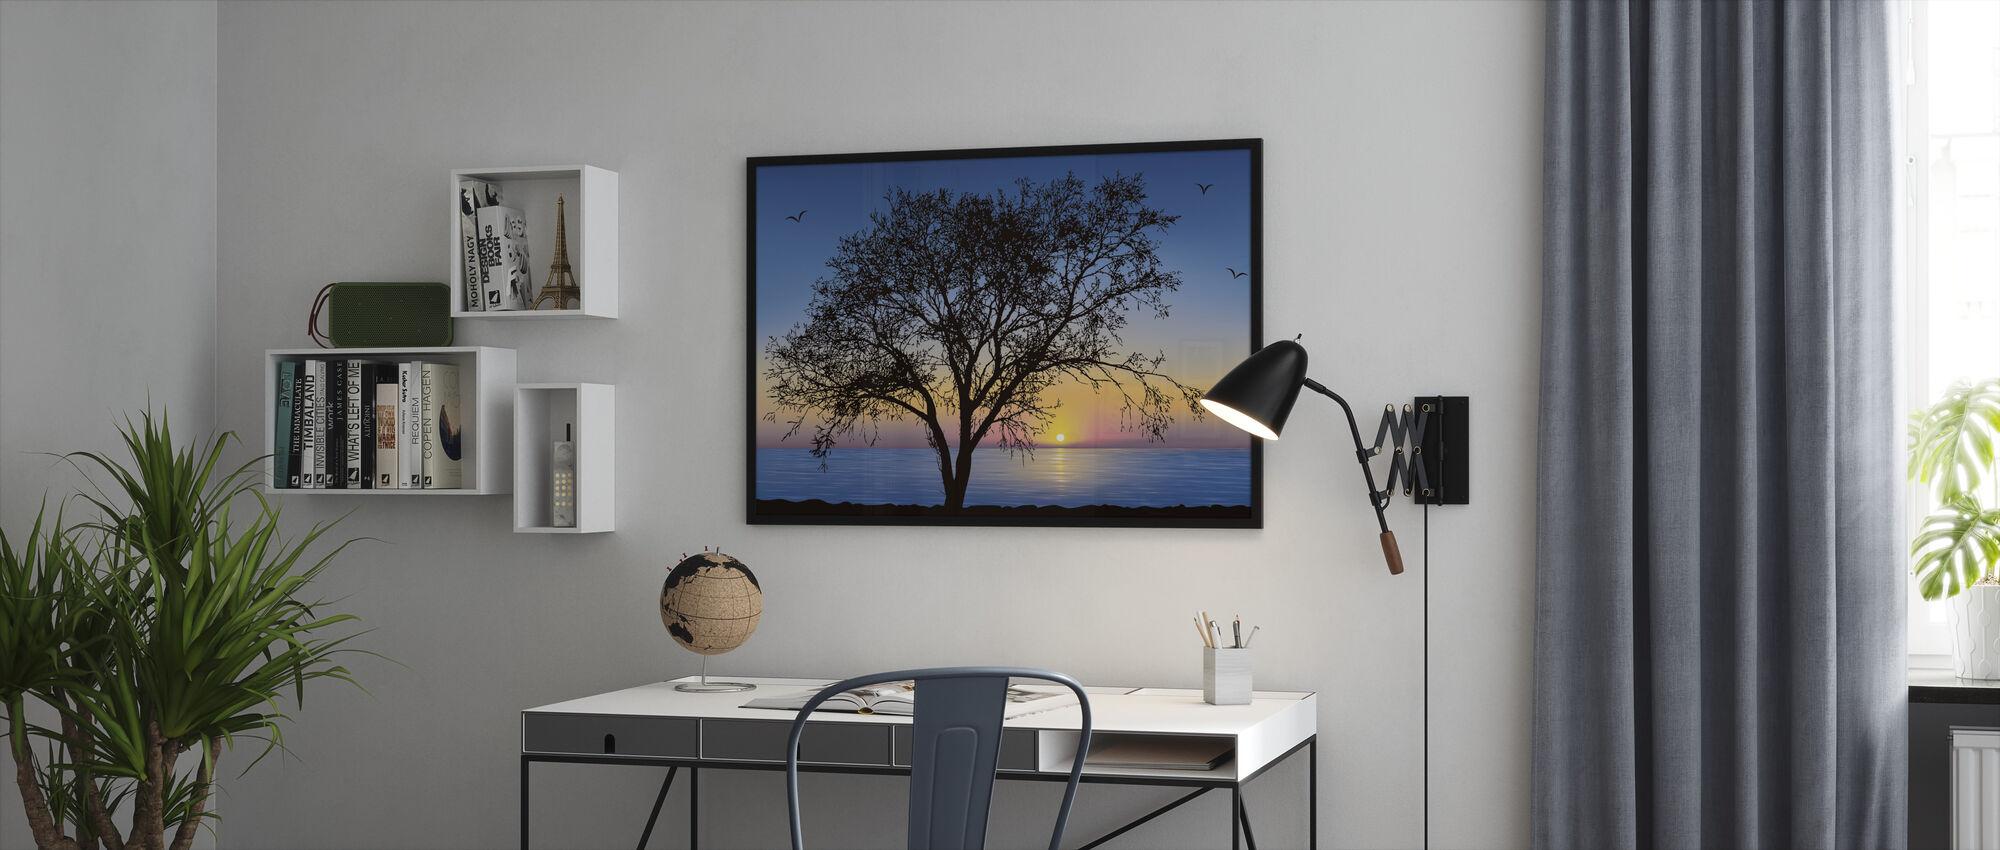 Treet Silhouette - Innrammet bilde - Kontor